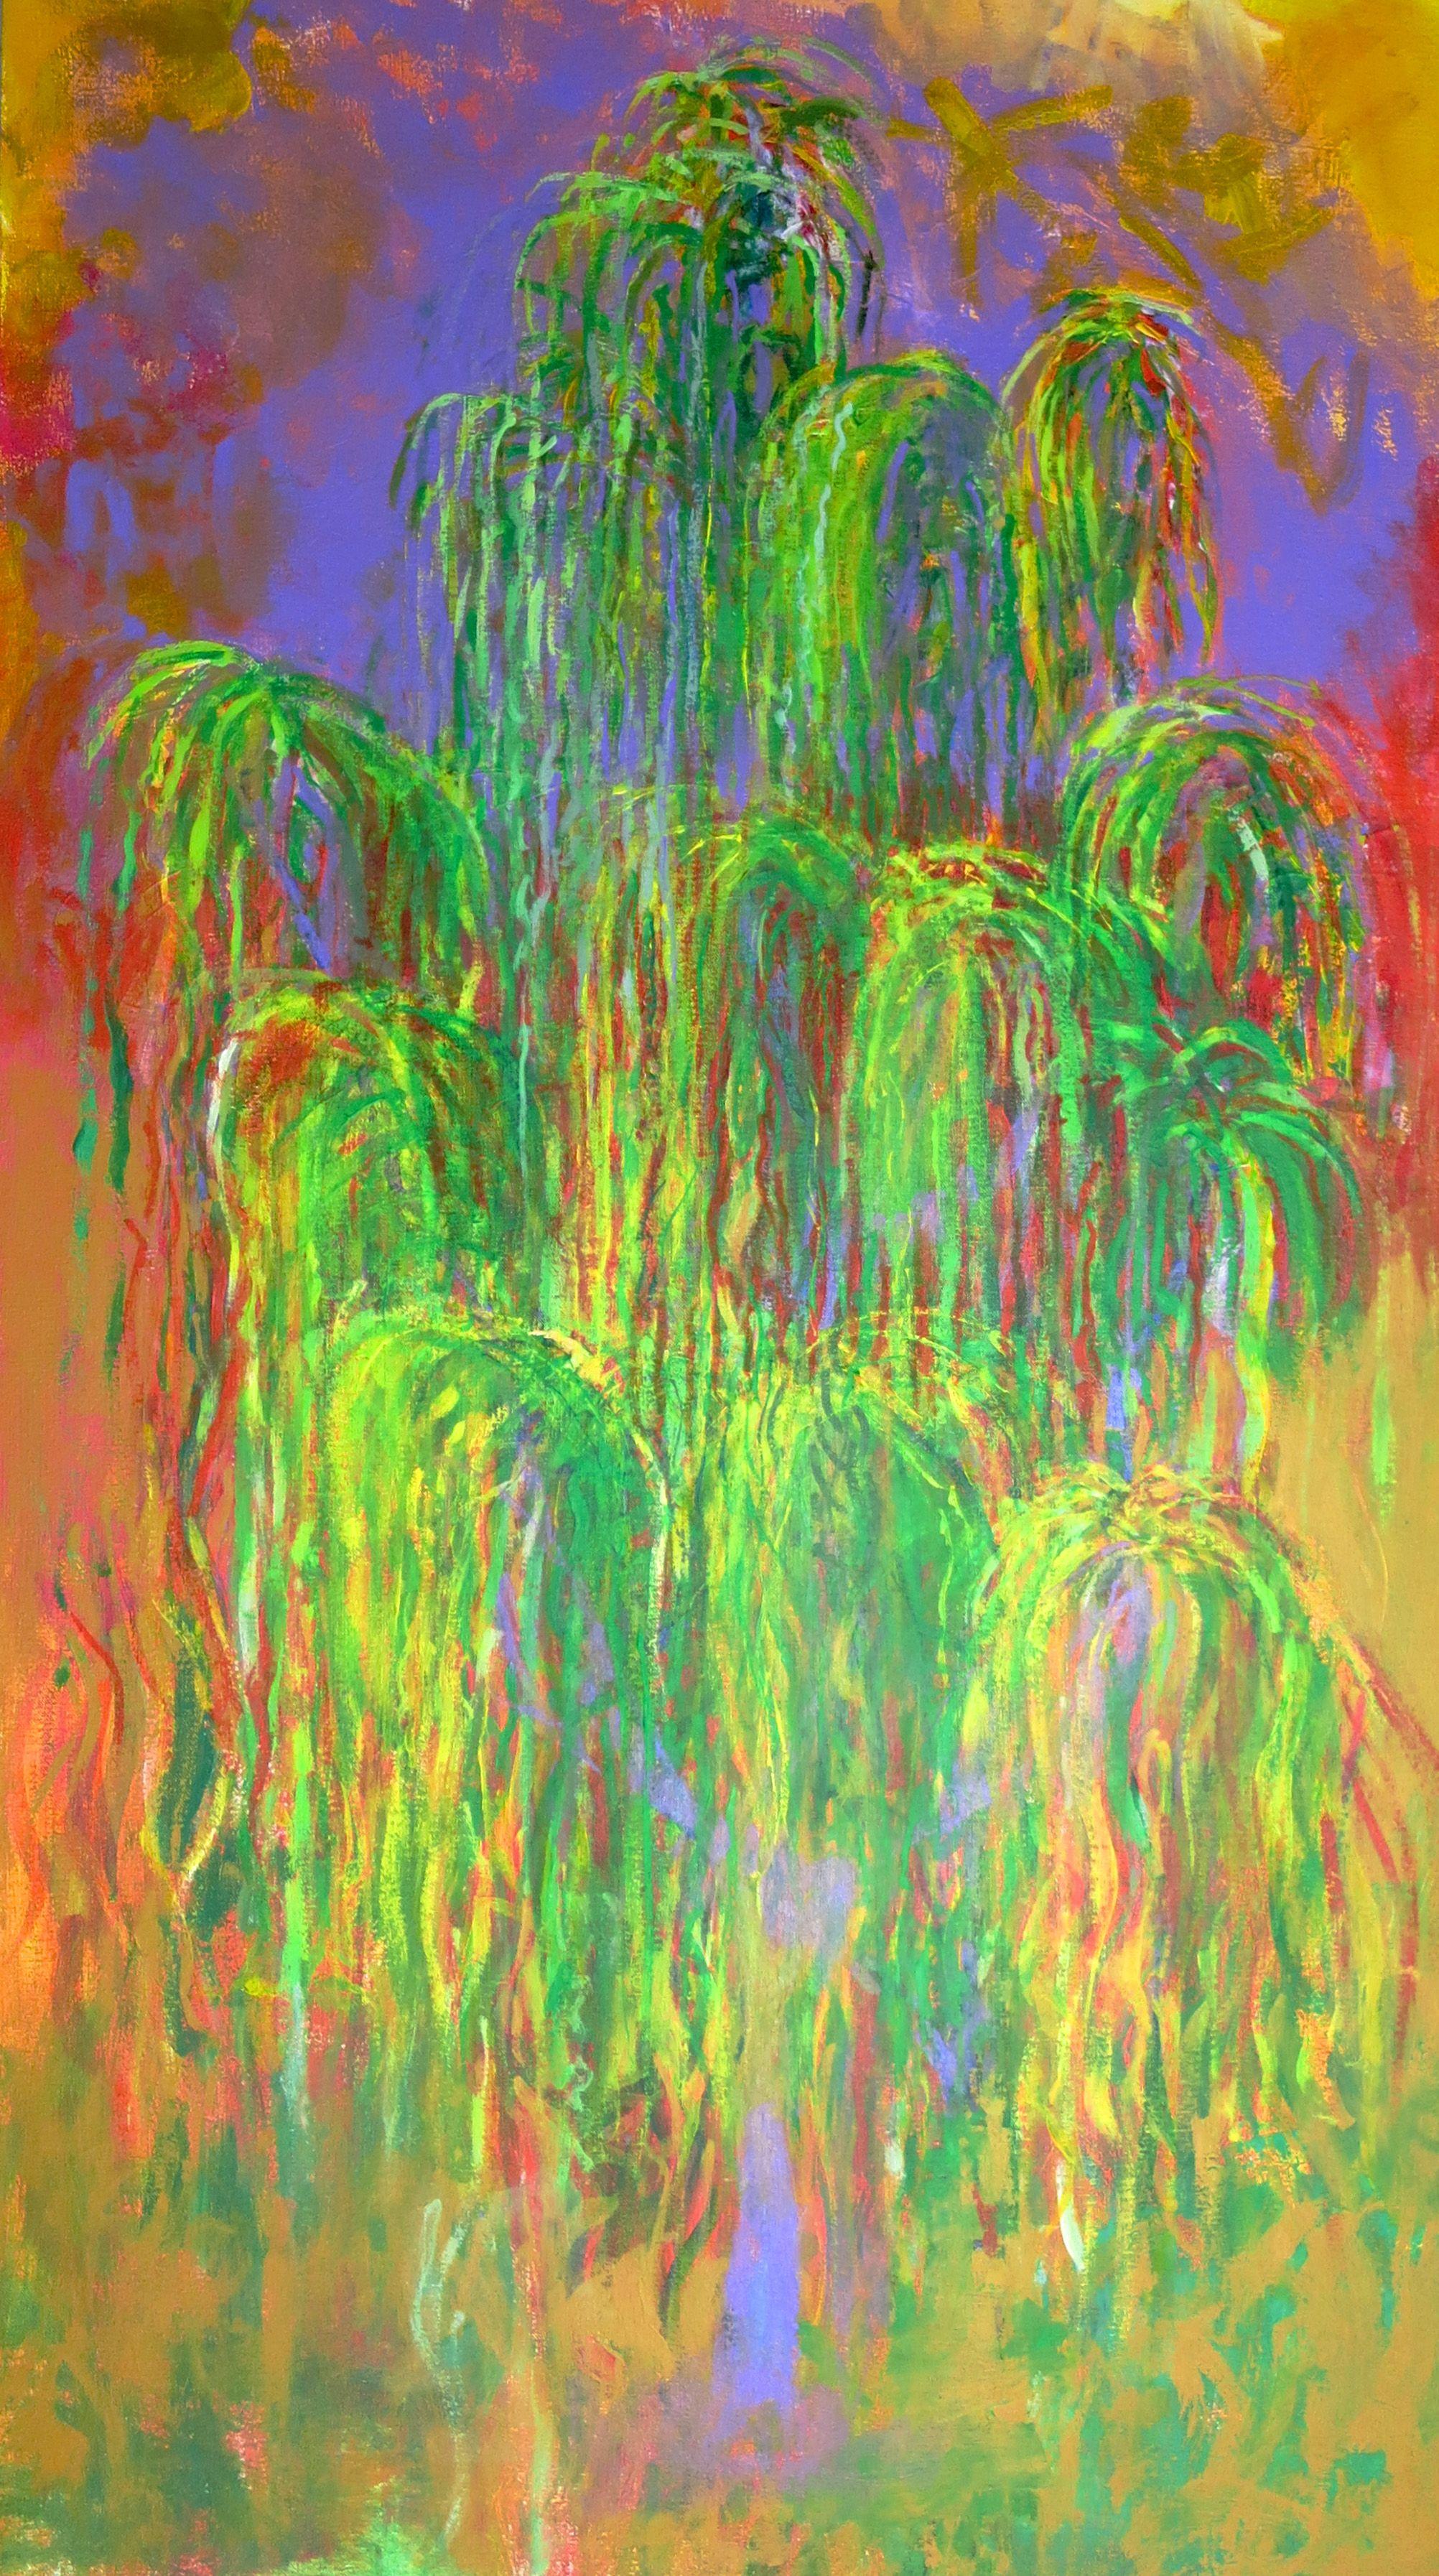 Pin by tom morton on TTM Recent PaintingsDingletrees